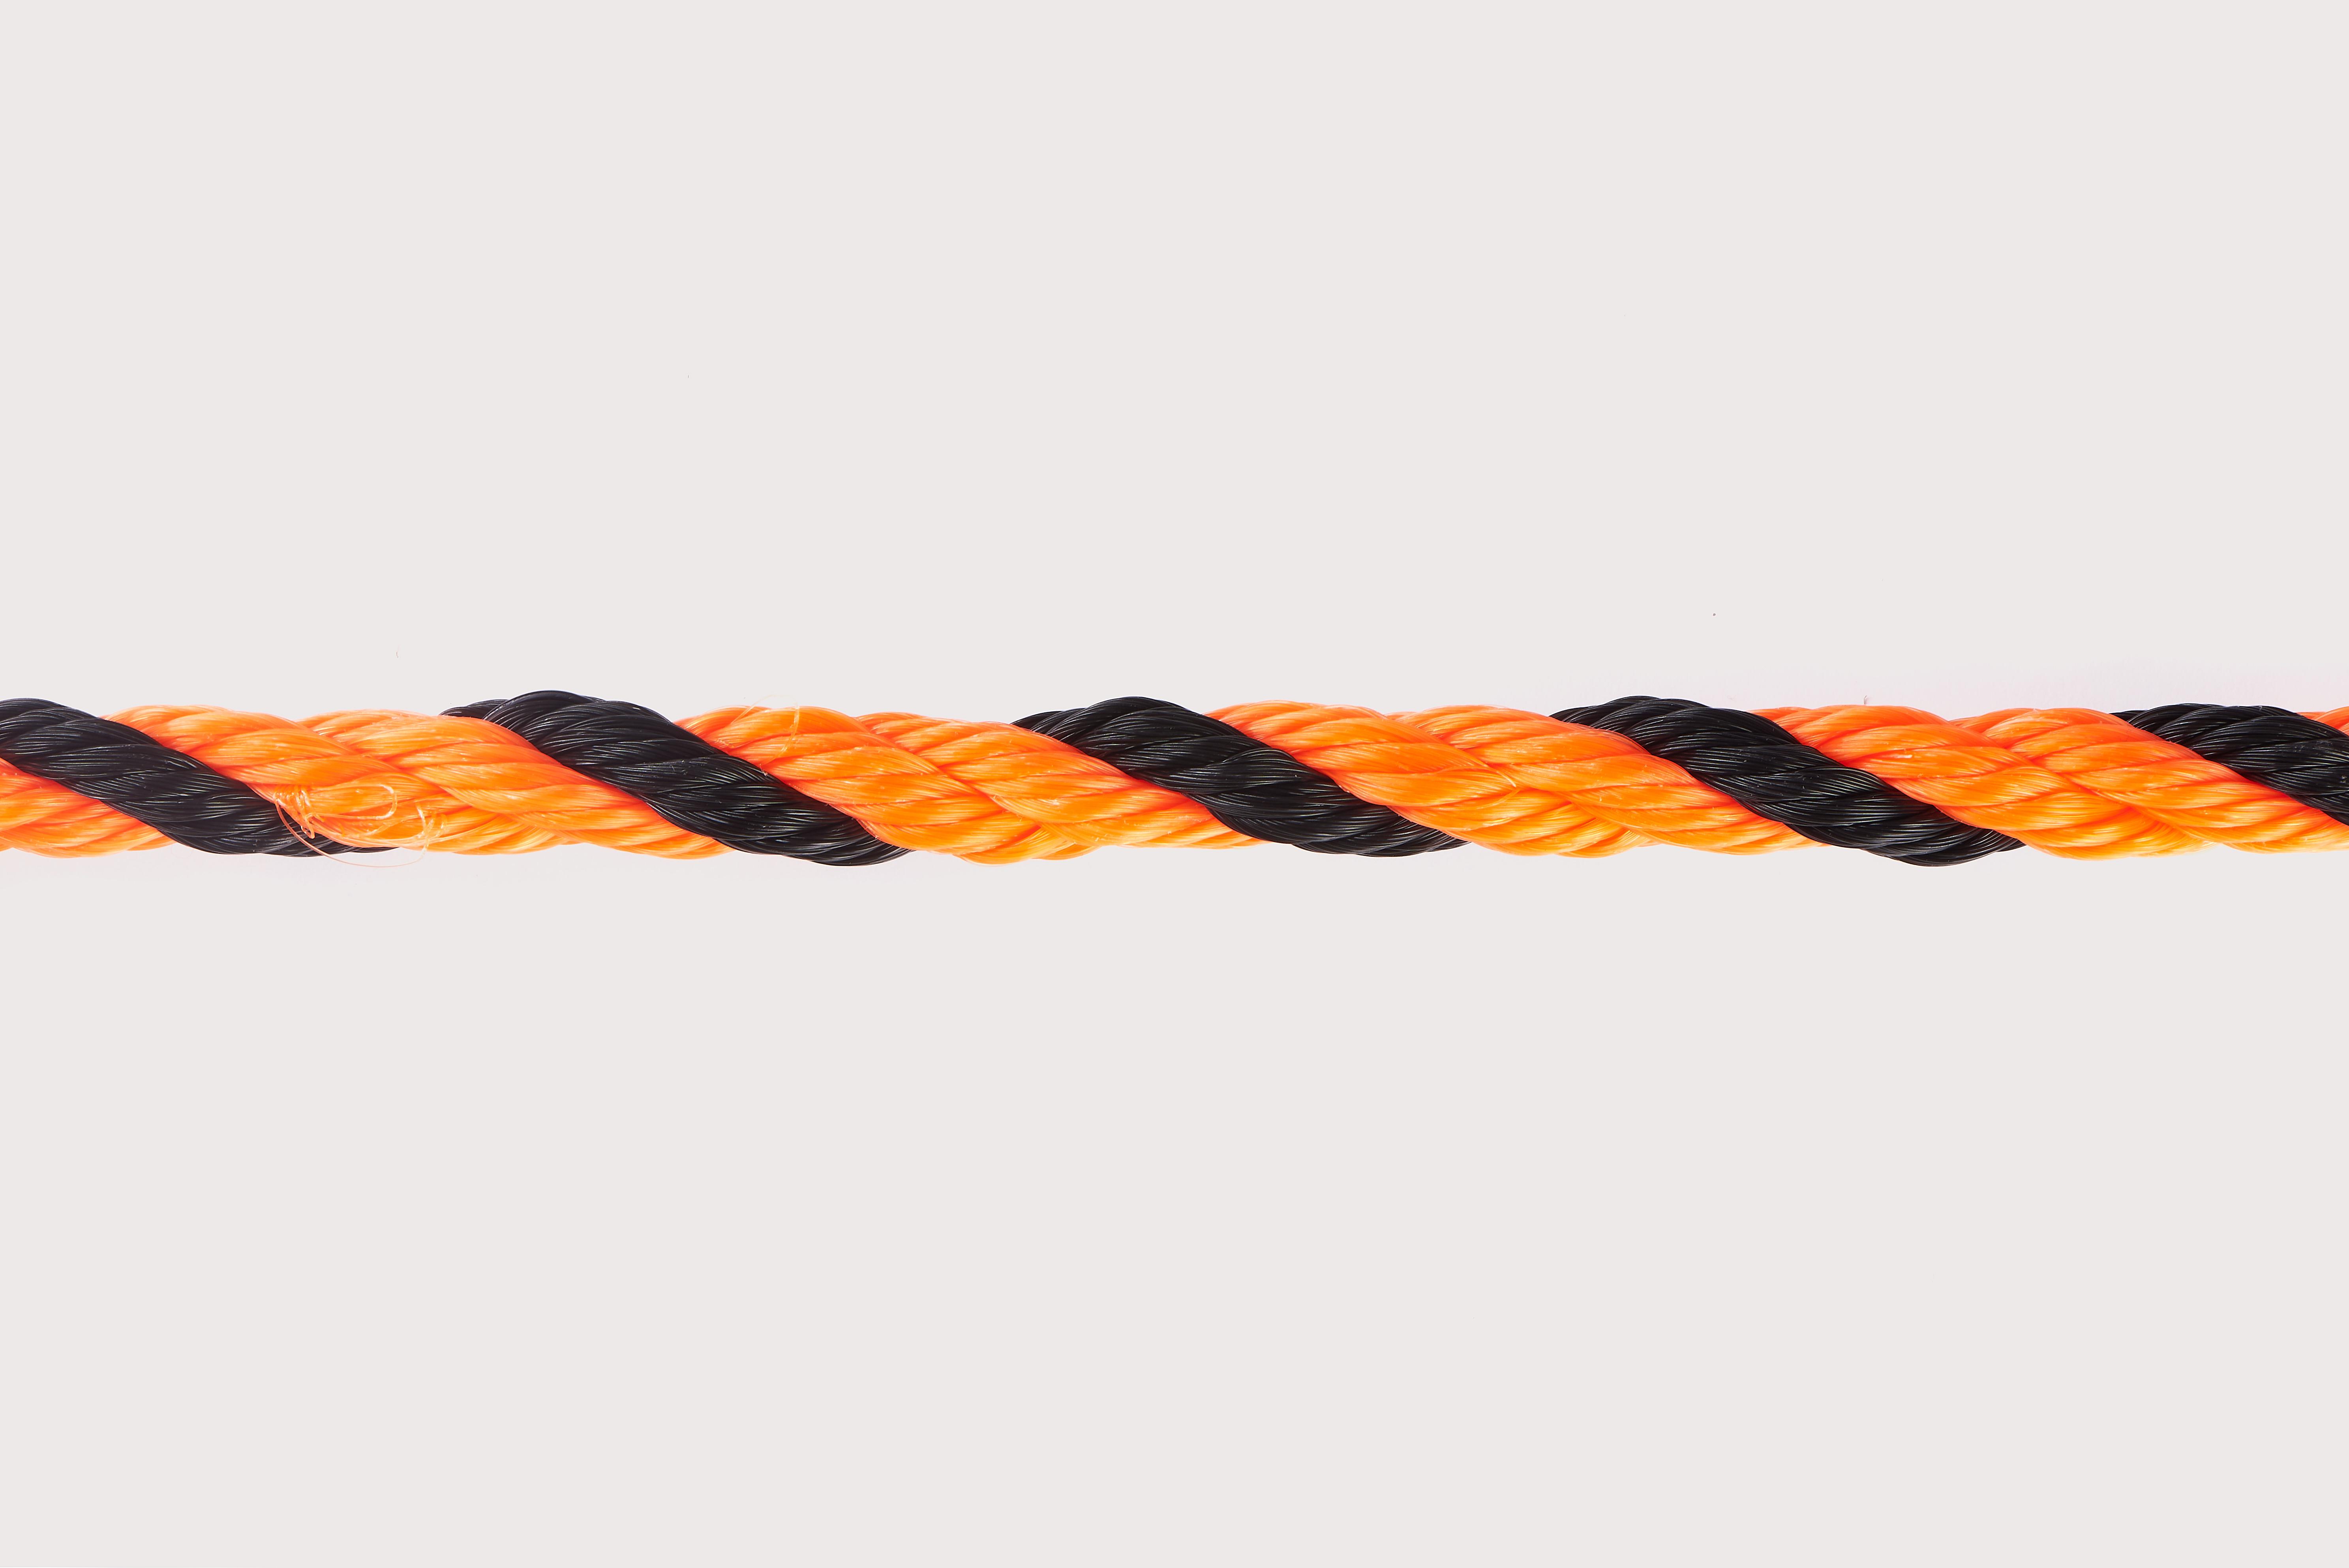 Orion-Cordage-3-Strand Monofilament Polypropylene-Orange I Black-Horizontal146.jpg